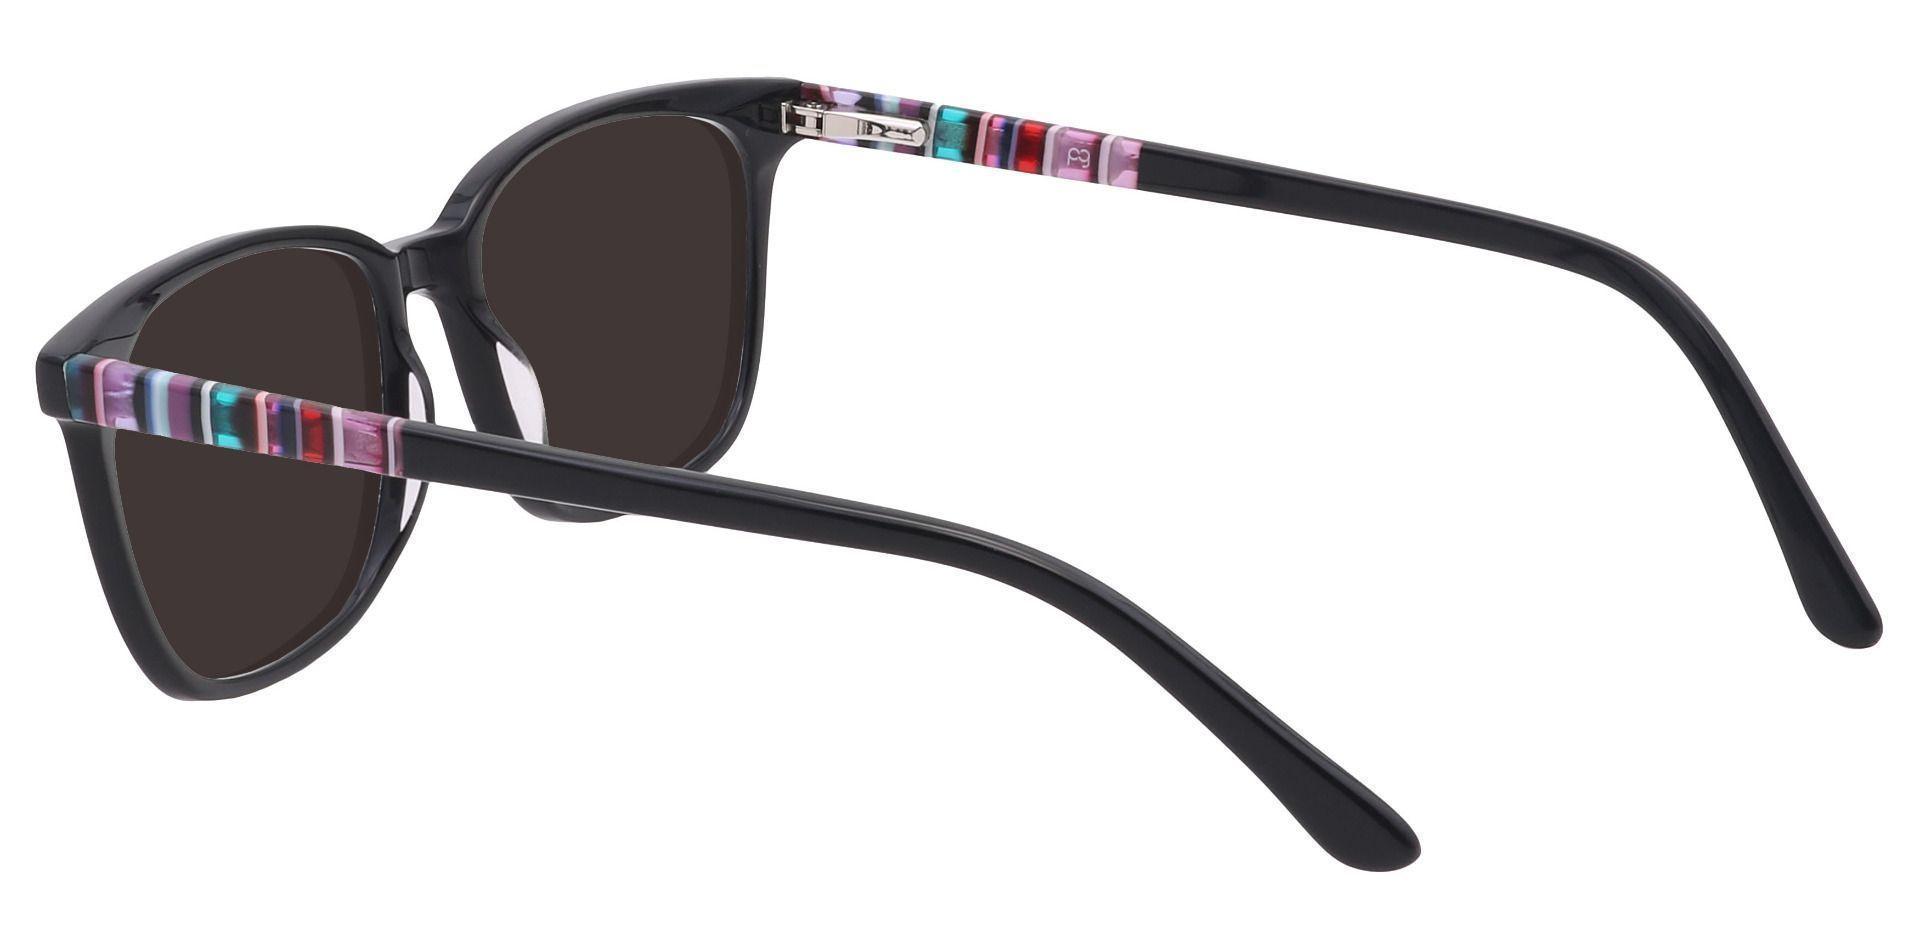 Fern Square Prescription Sunglasses - Black Frame With Gray Lenses